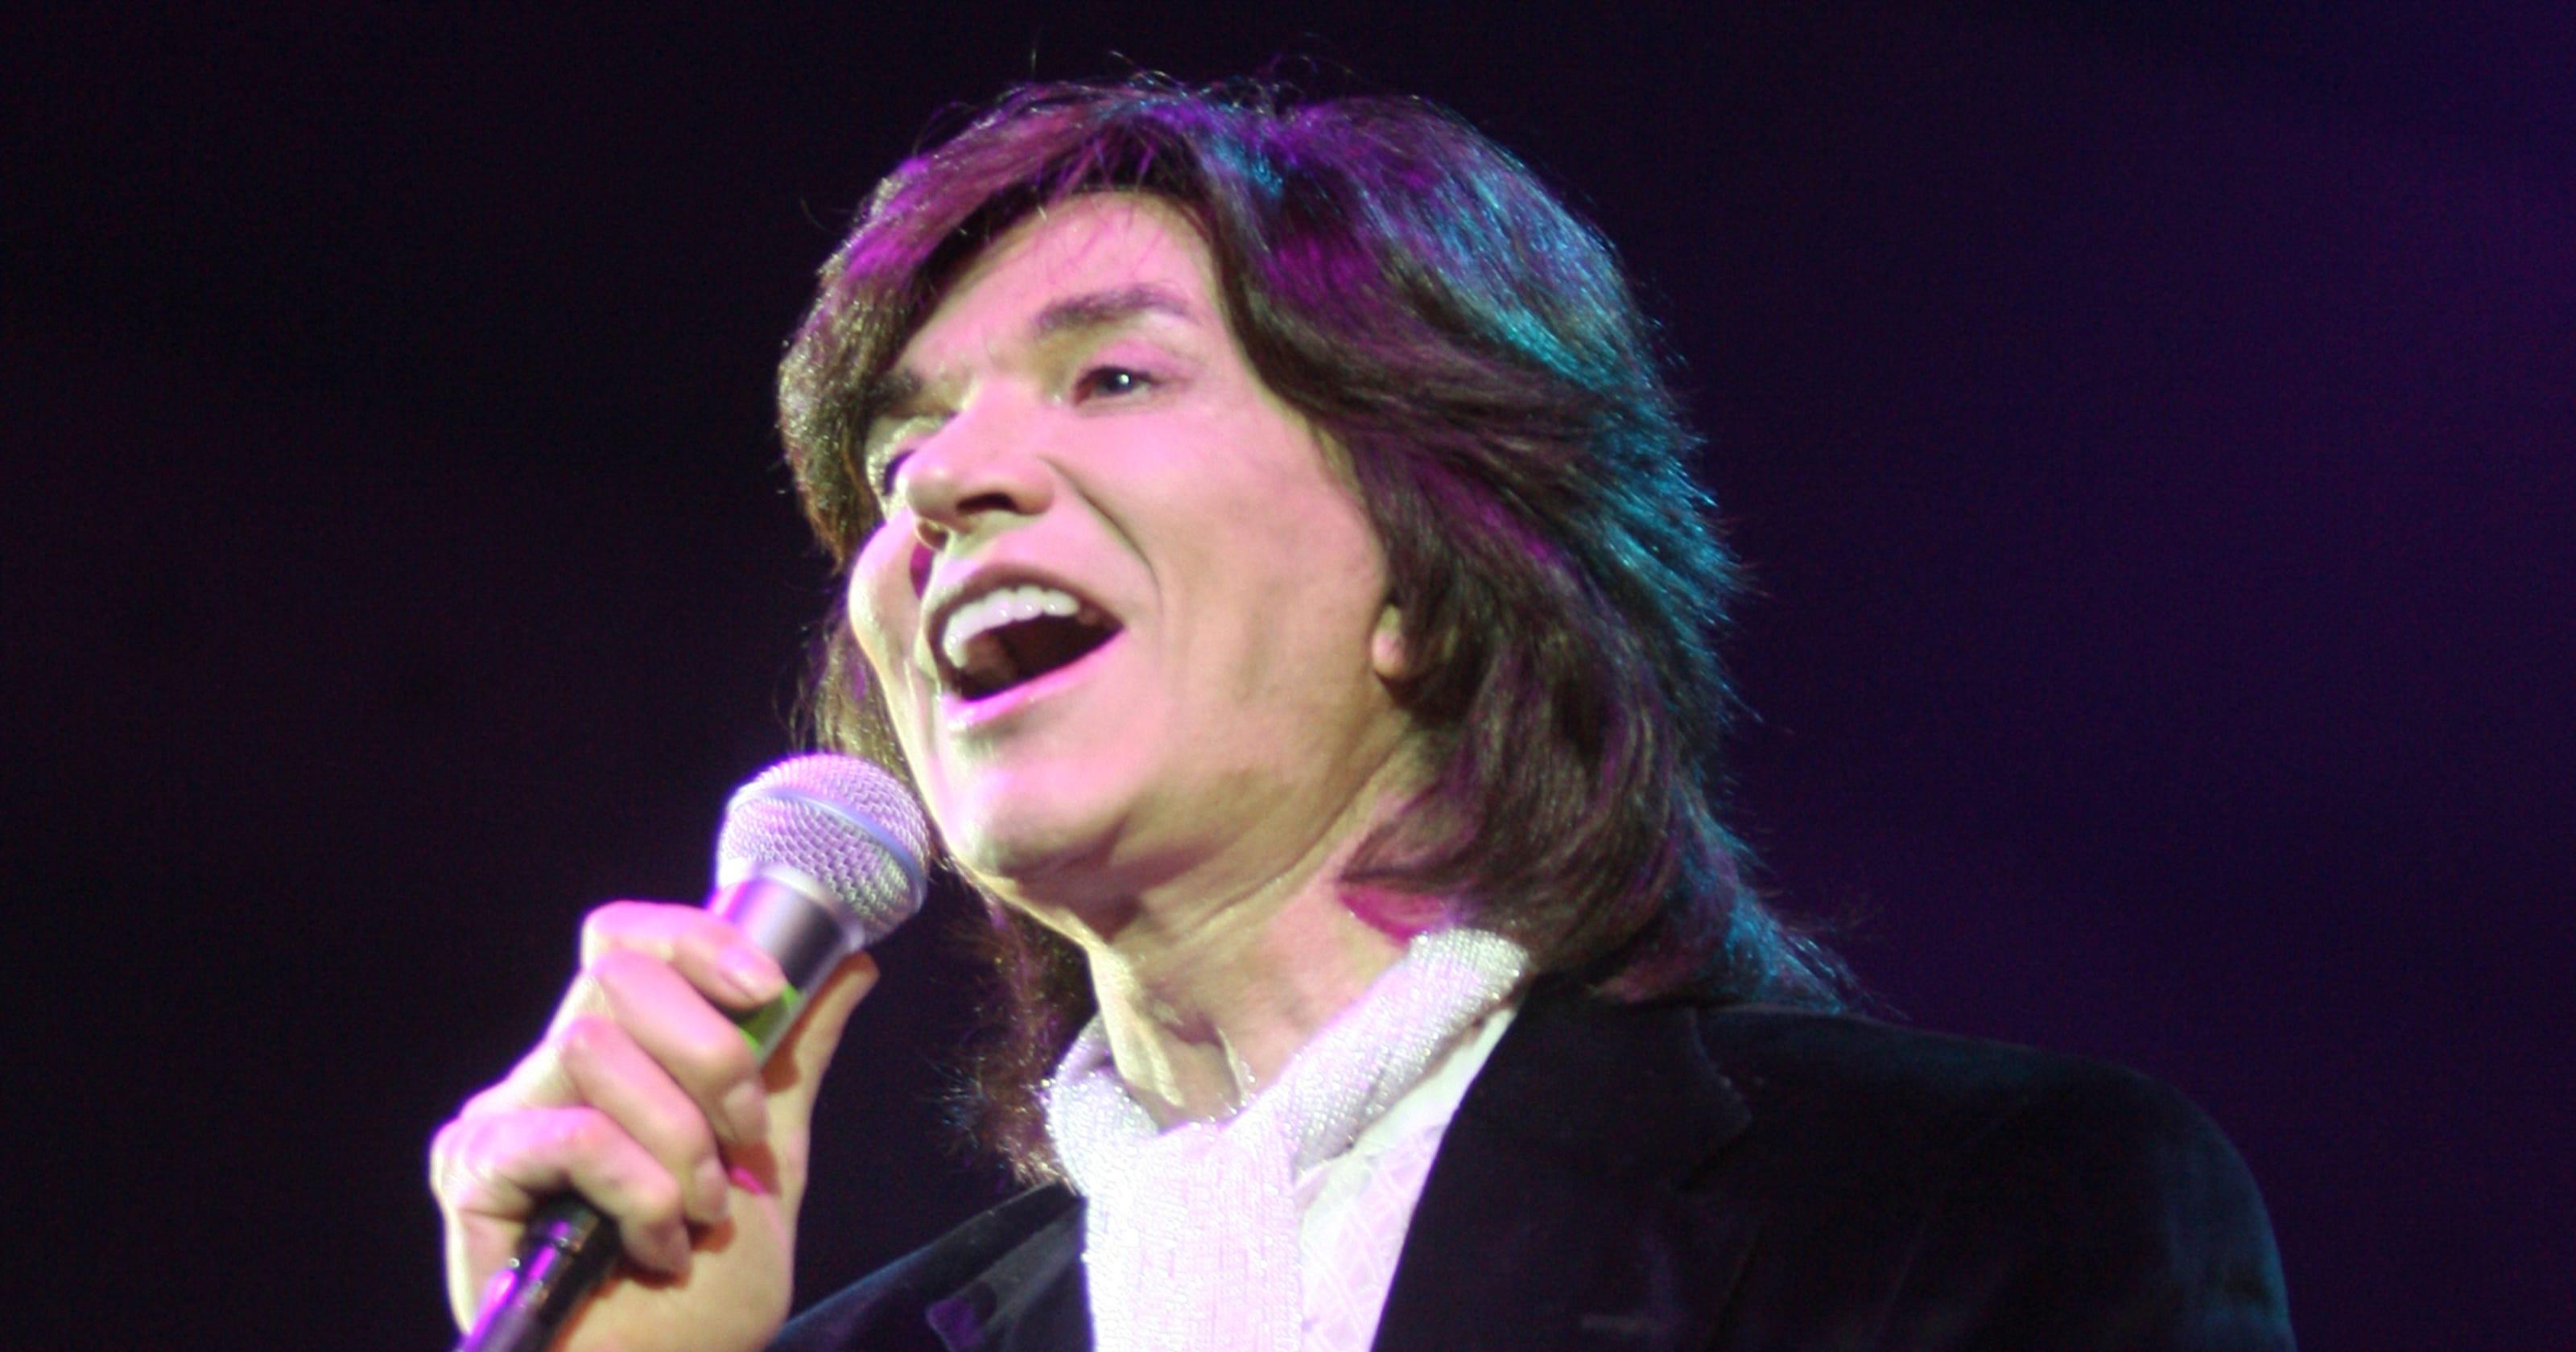 IMG CAMILO SESTO, Spanish Singer